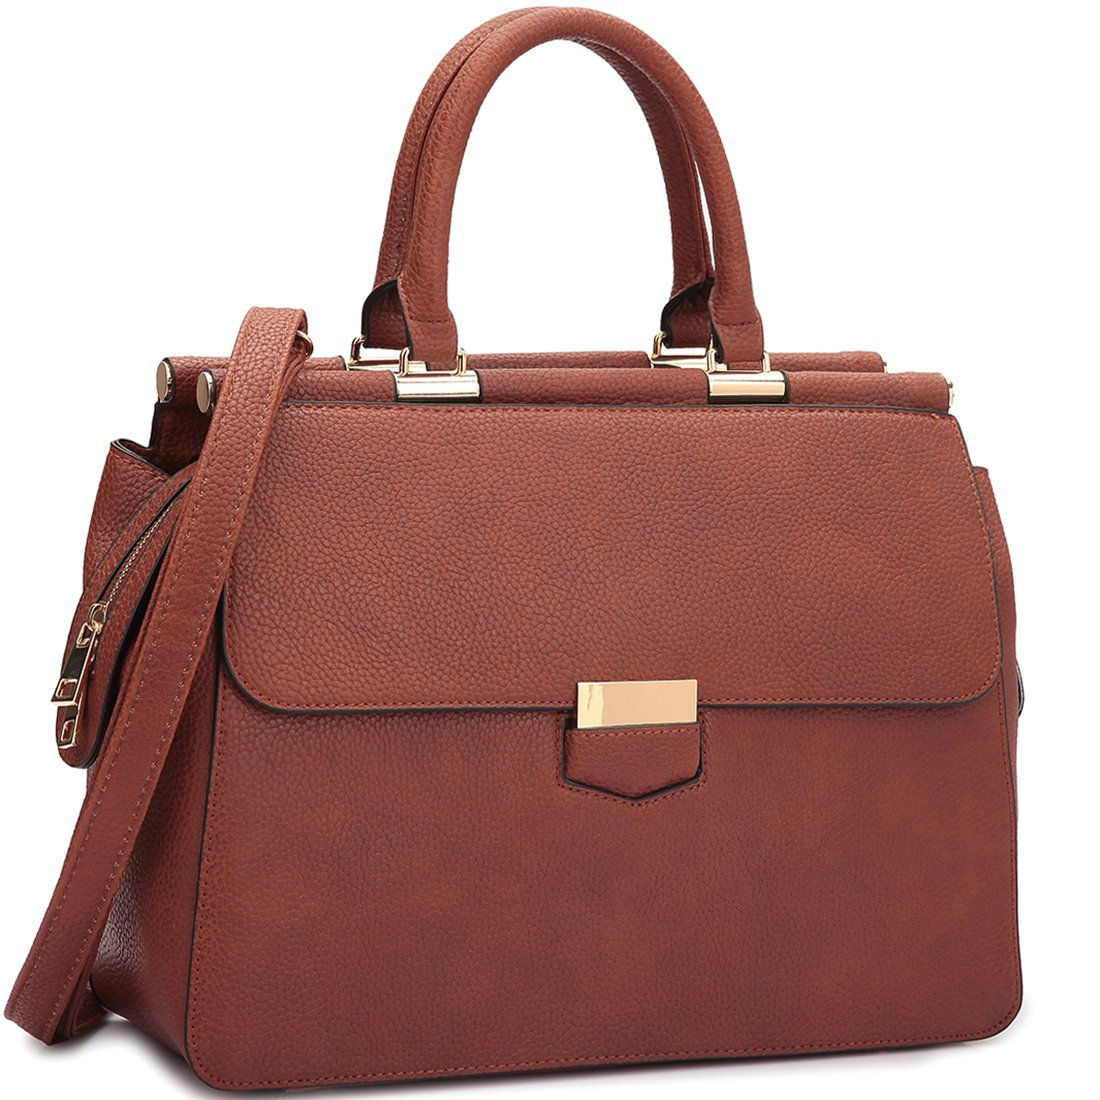 MKY Women Flapover Briefcase Leather Messenger Bag Designer Purse w/ Removable Shoulder Strap Brown